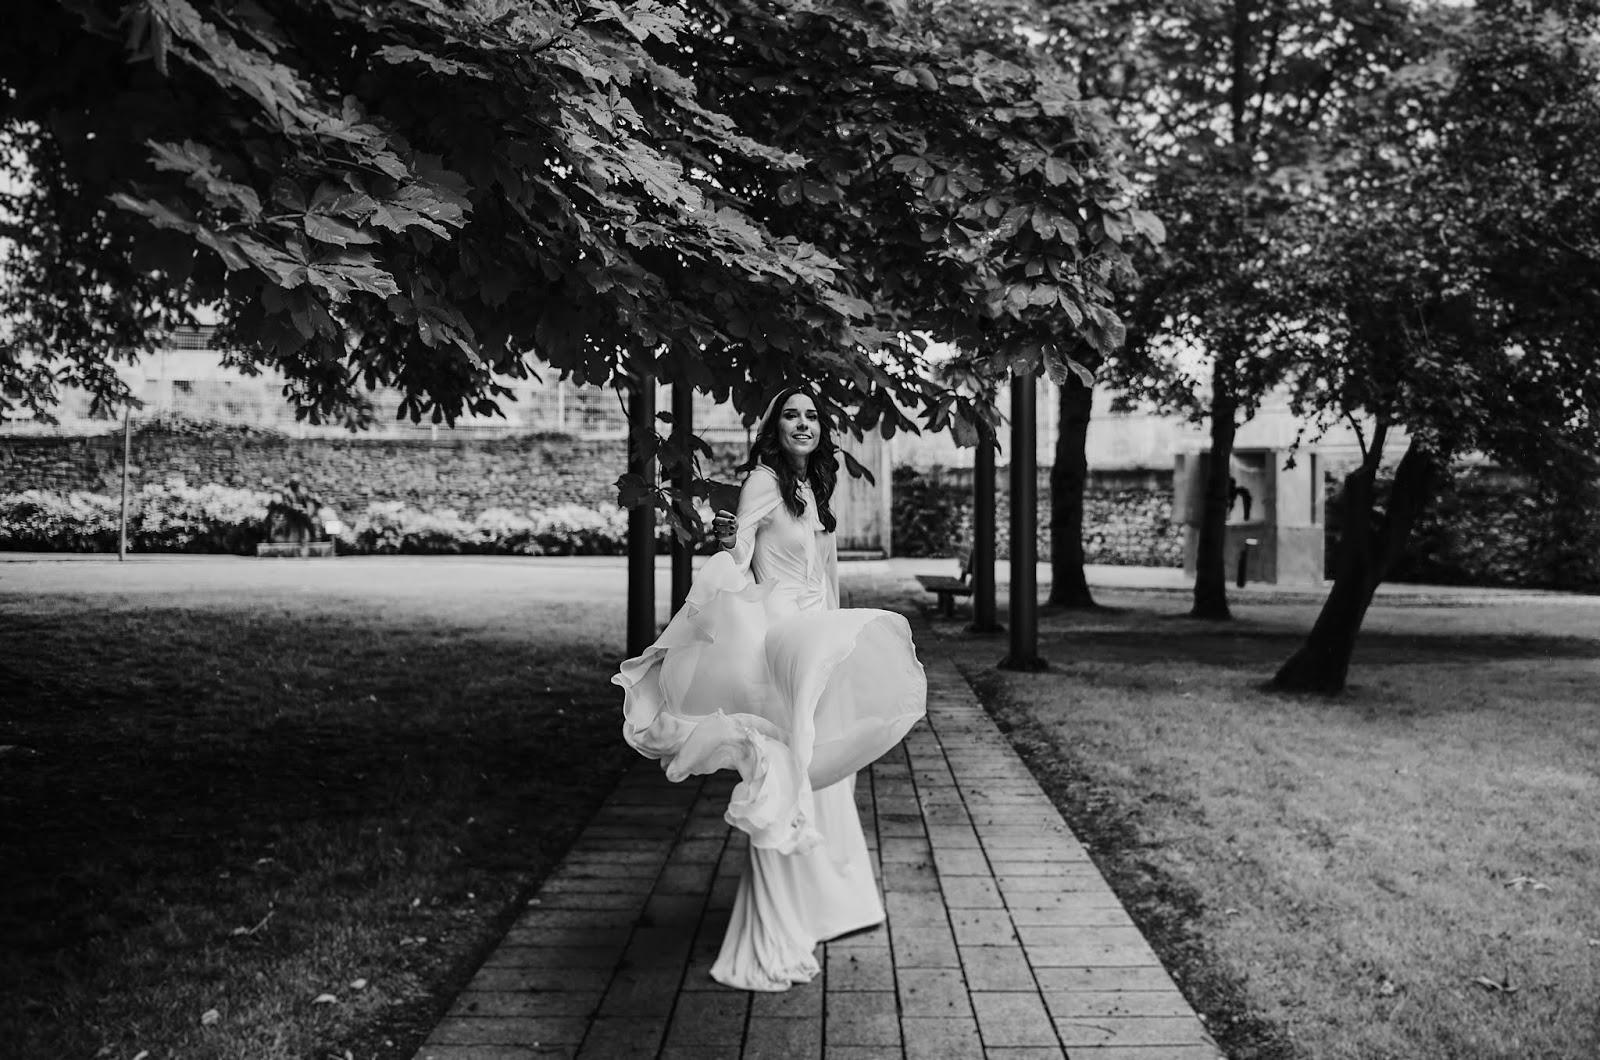 MODERN AND MINIMAL WEDDING